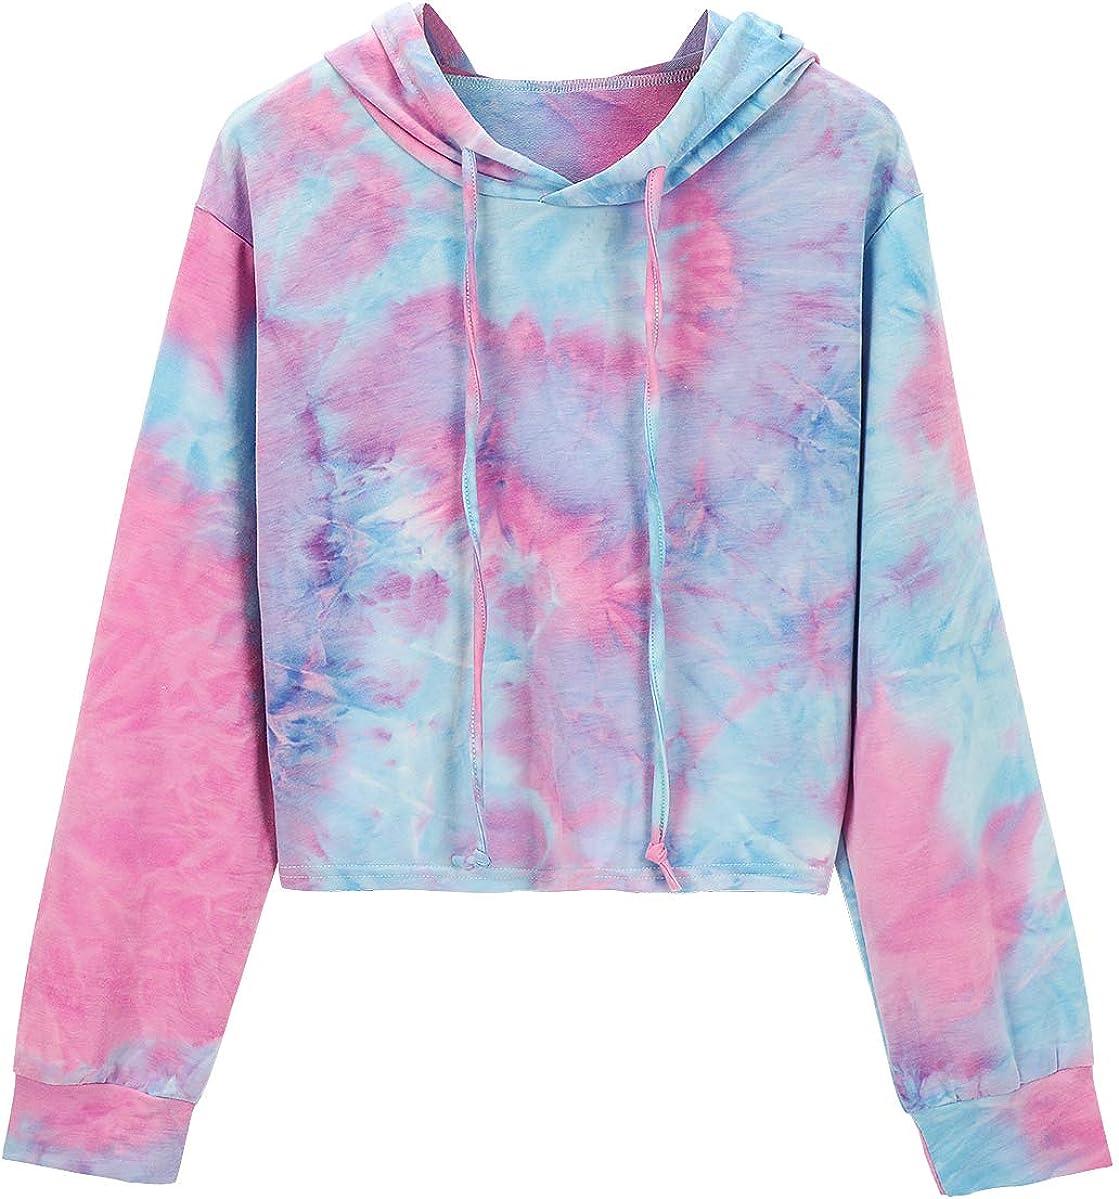 MYHALF Women Tie Dye Long Sleeve Crop Top Casual Drawstring Sweatshirt Fashion Crop Hoodie